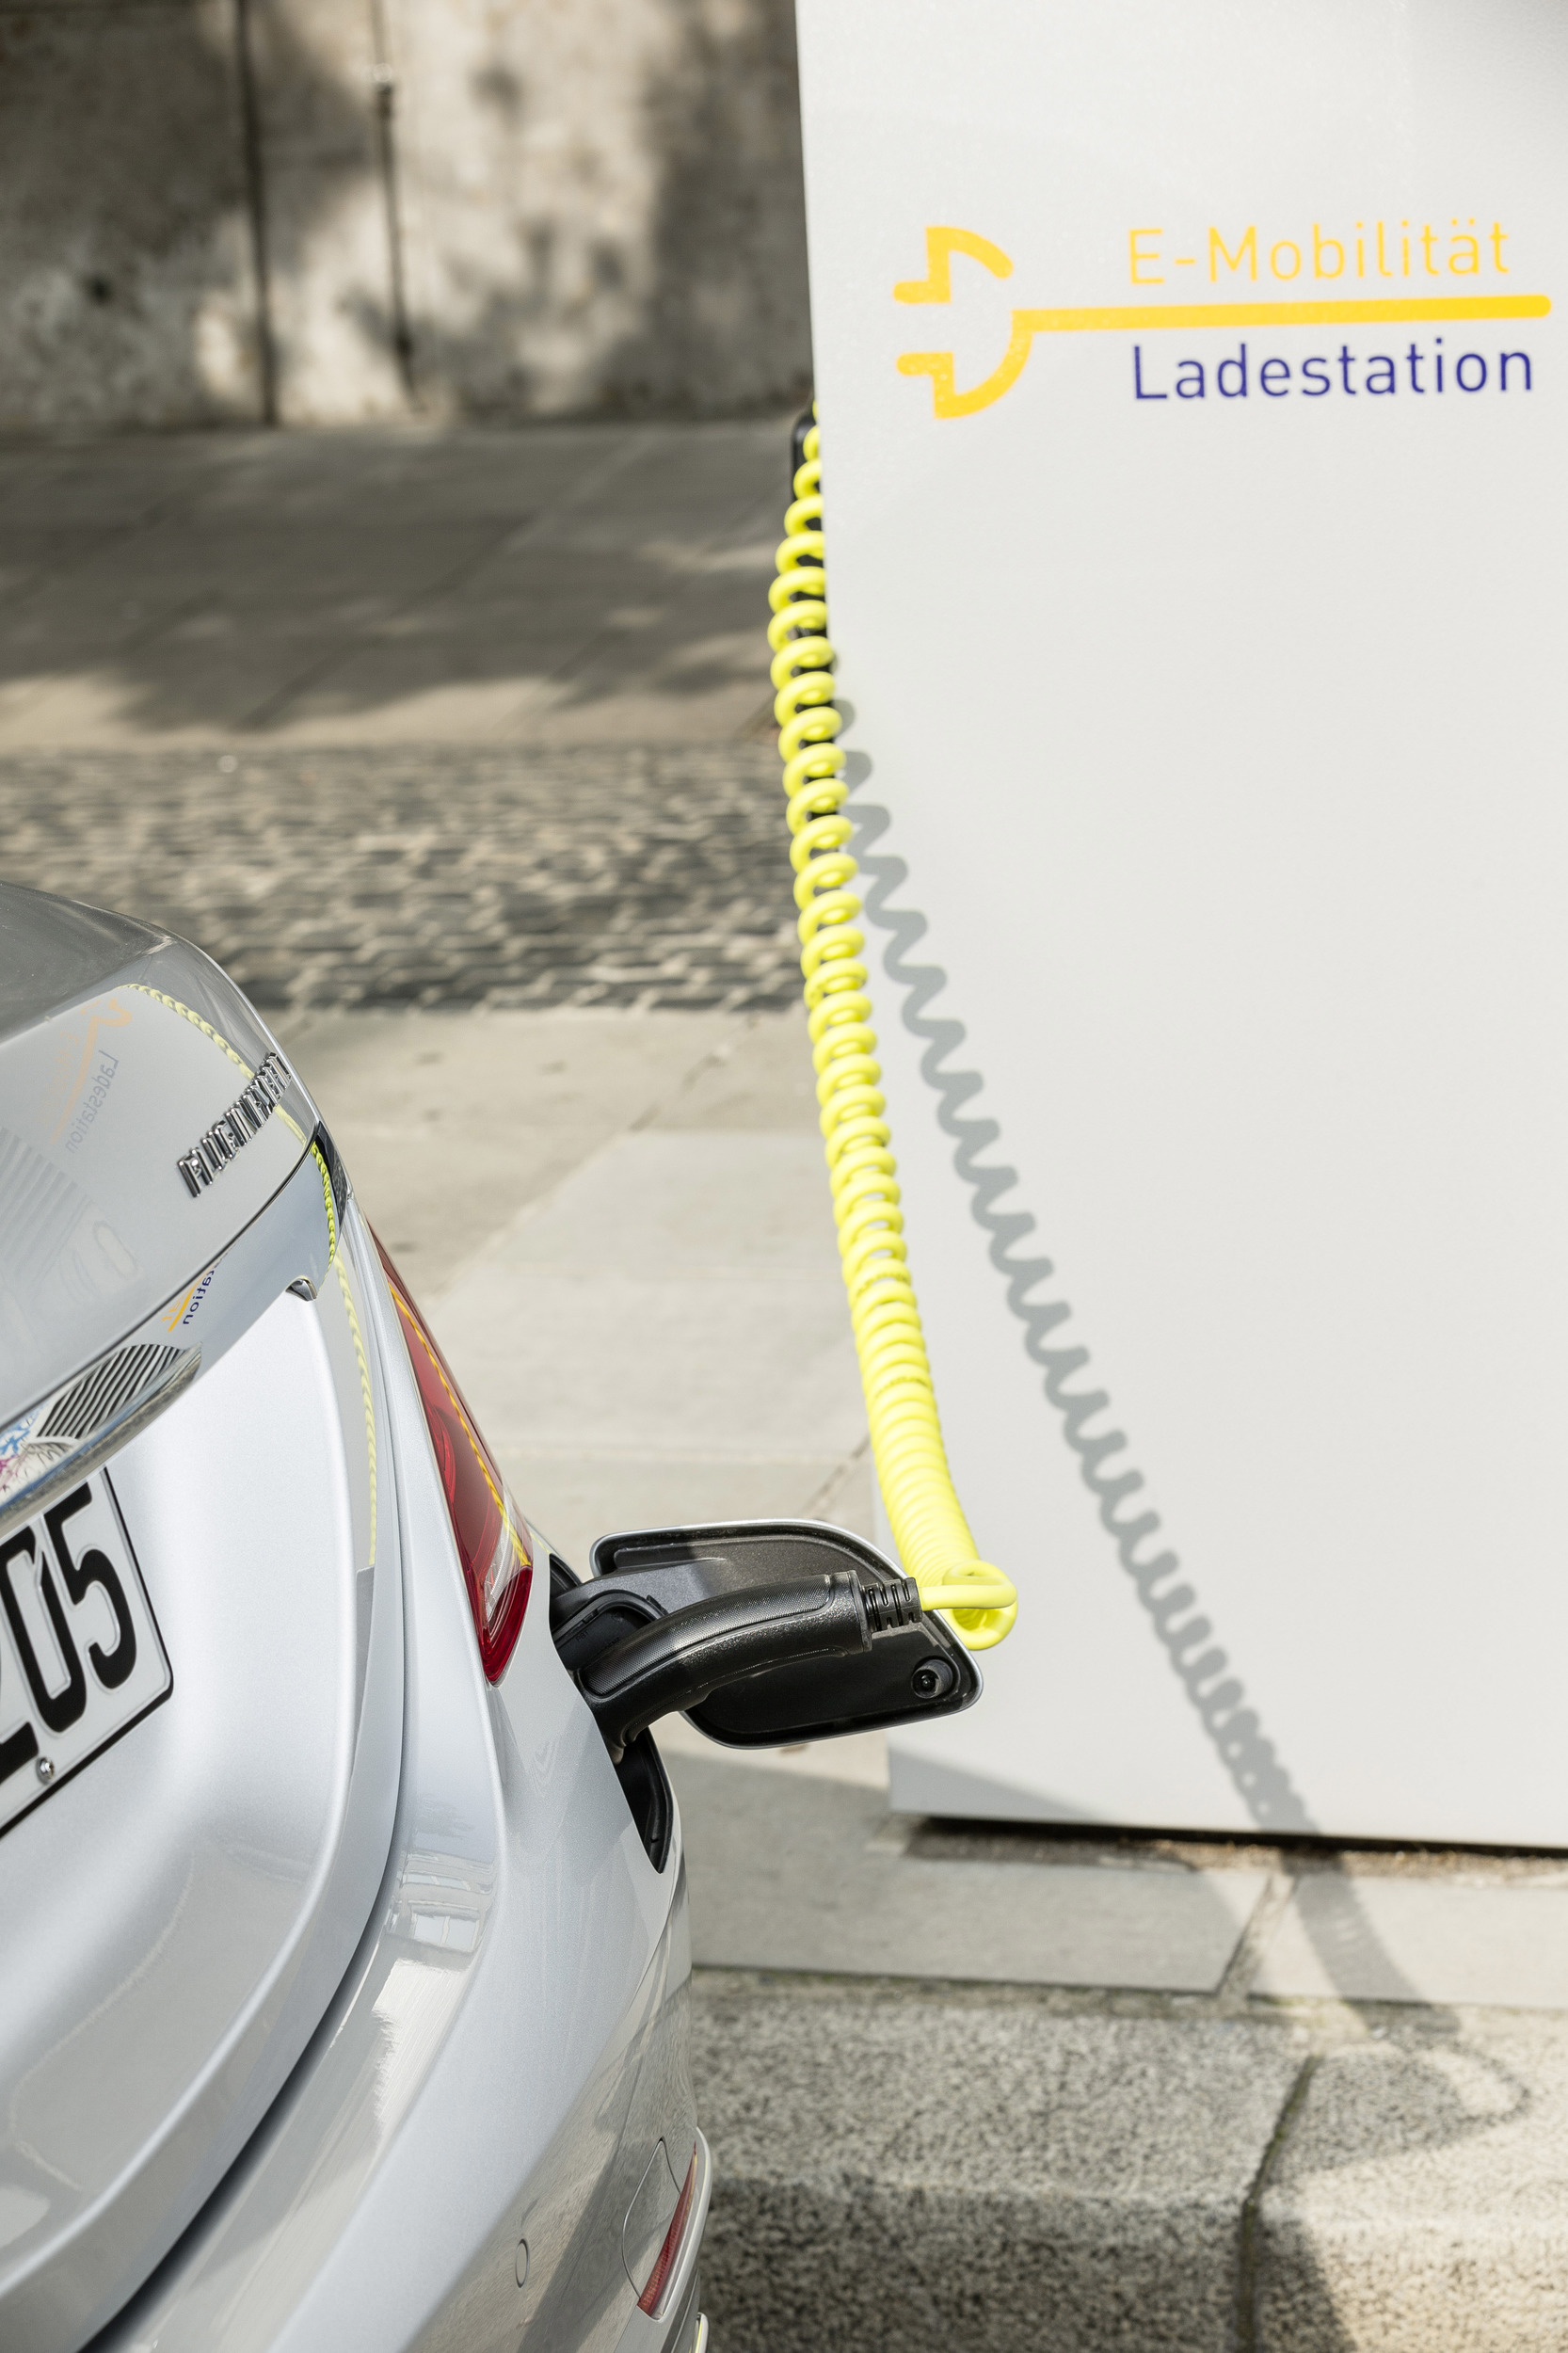 Mercedes S550 Hybrid charging